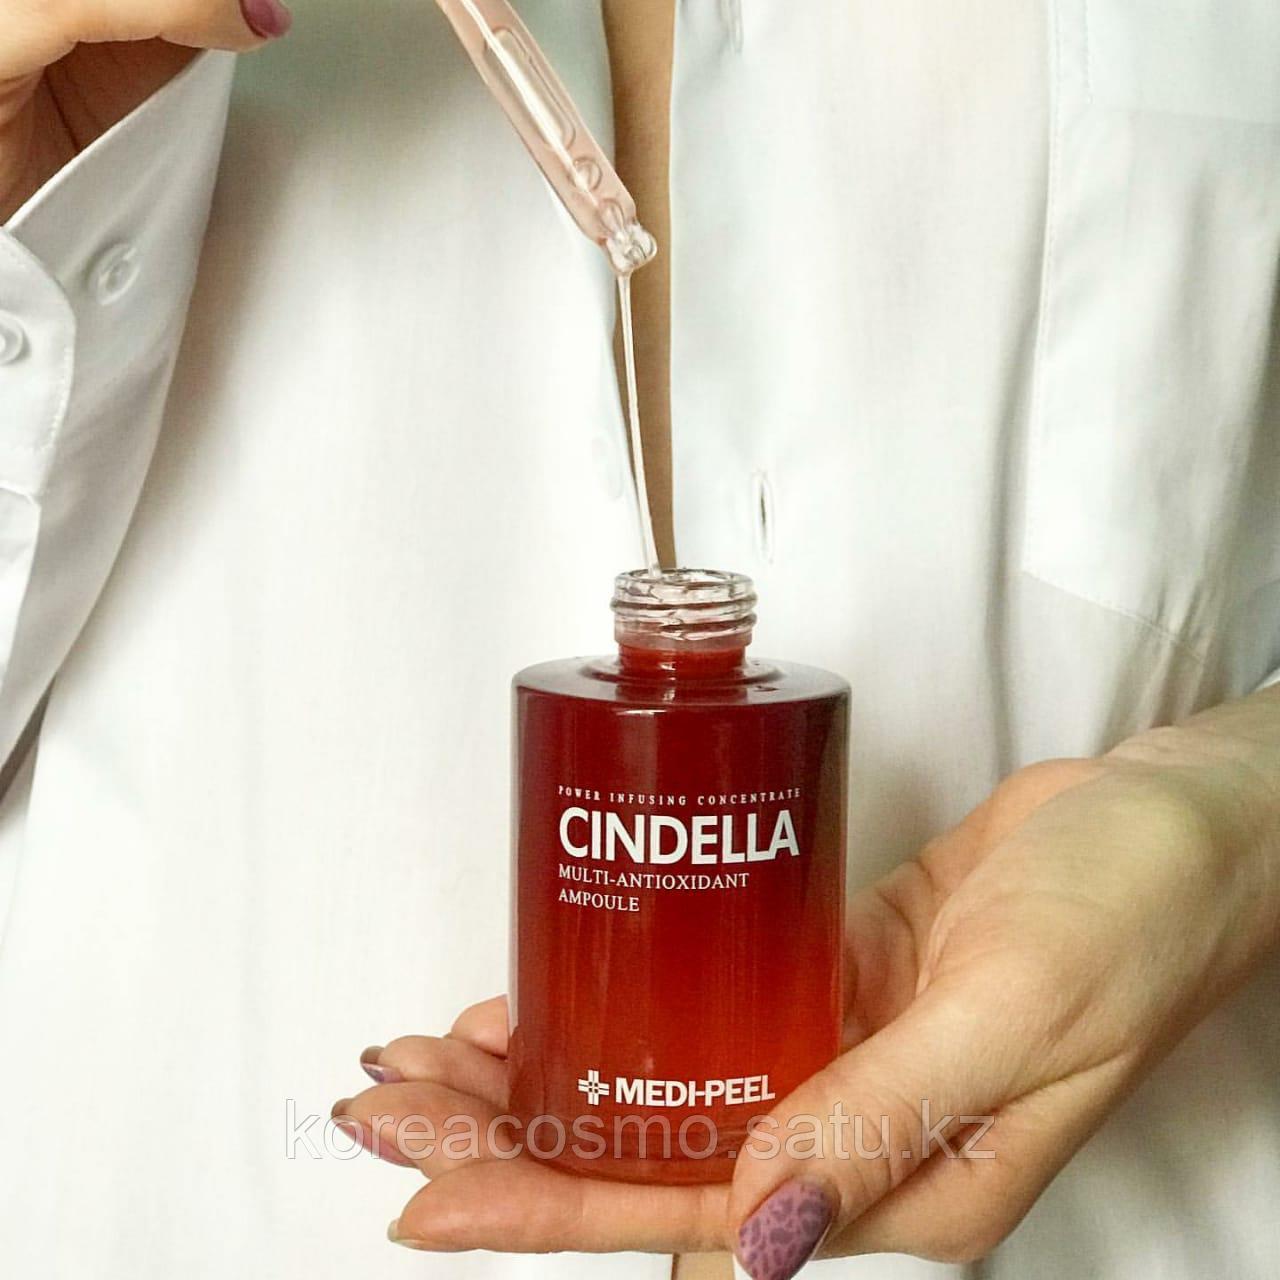 Сыворотка антивозрастная MEDI-PEEL Cindella Multi-Antioxidant Ampoule 100мл